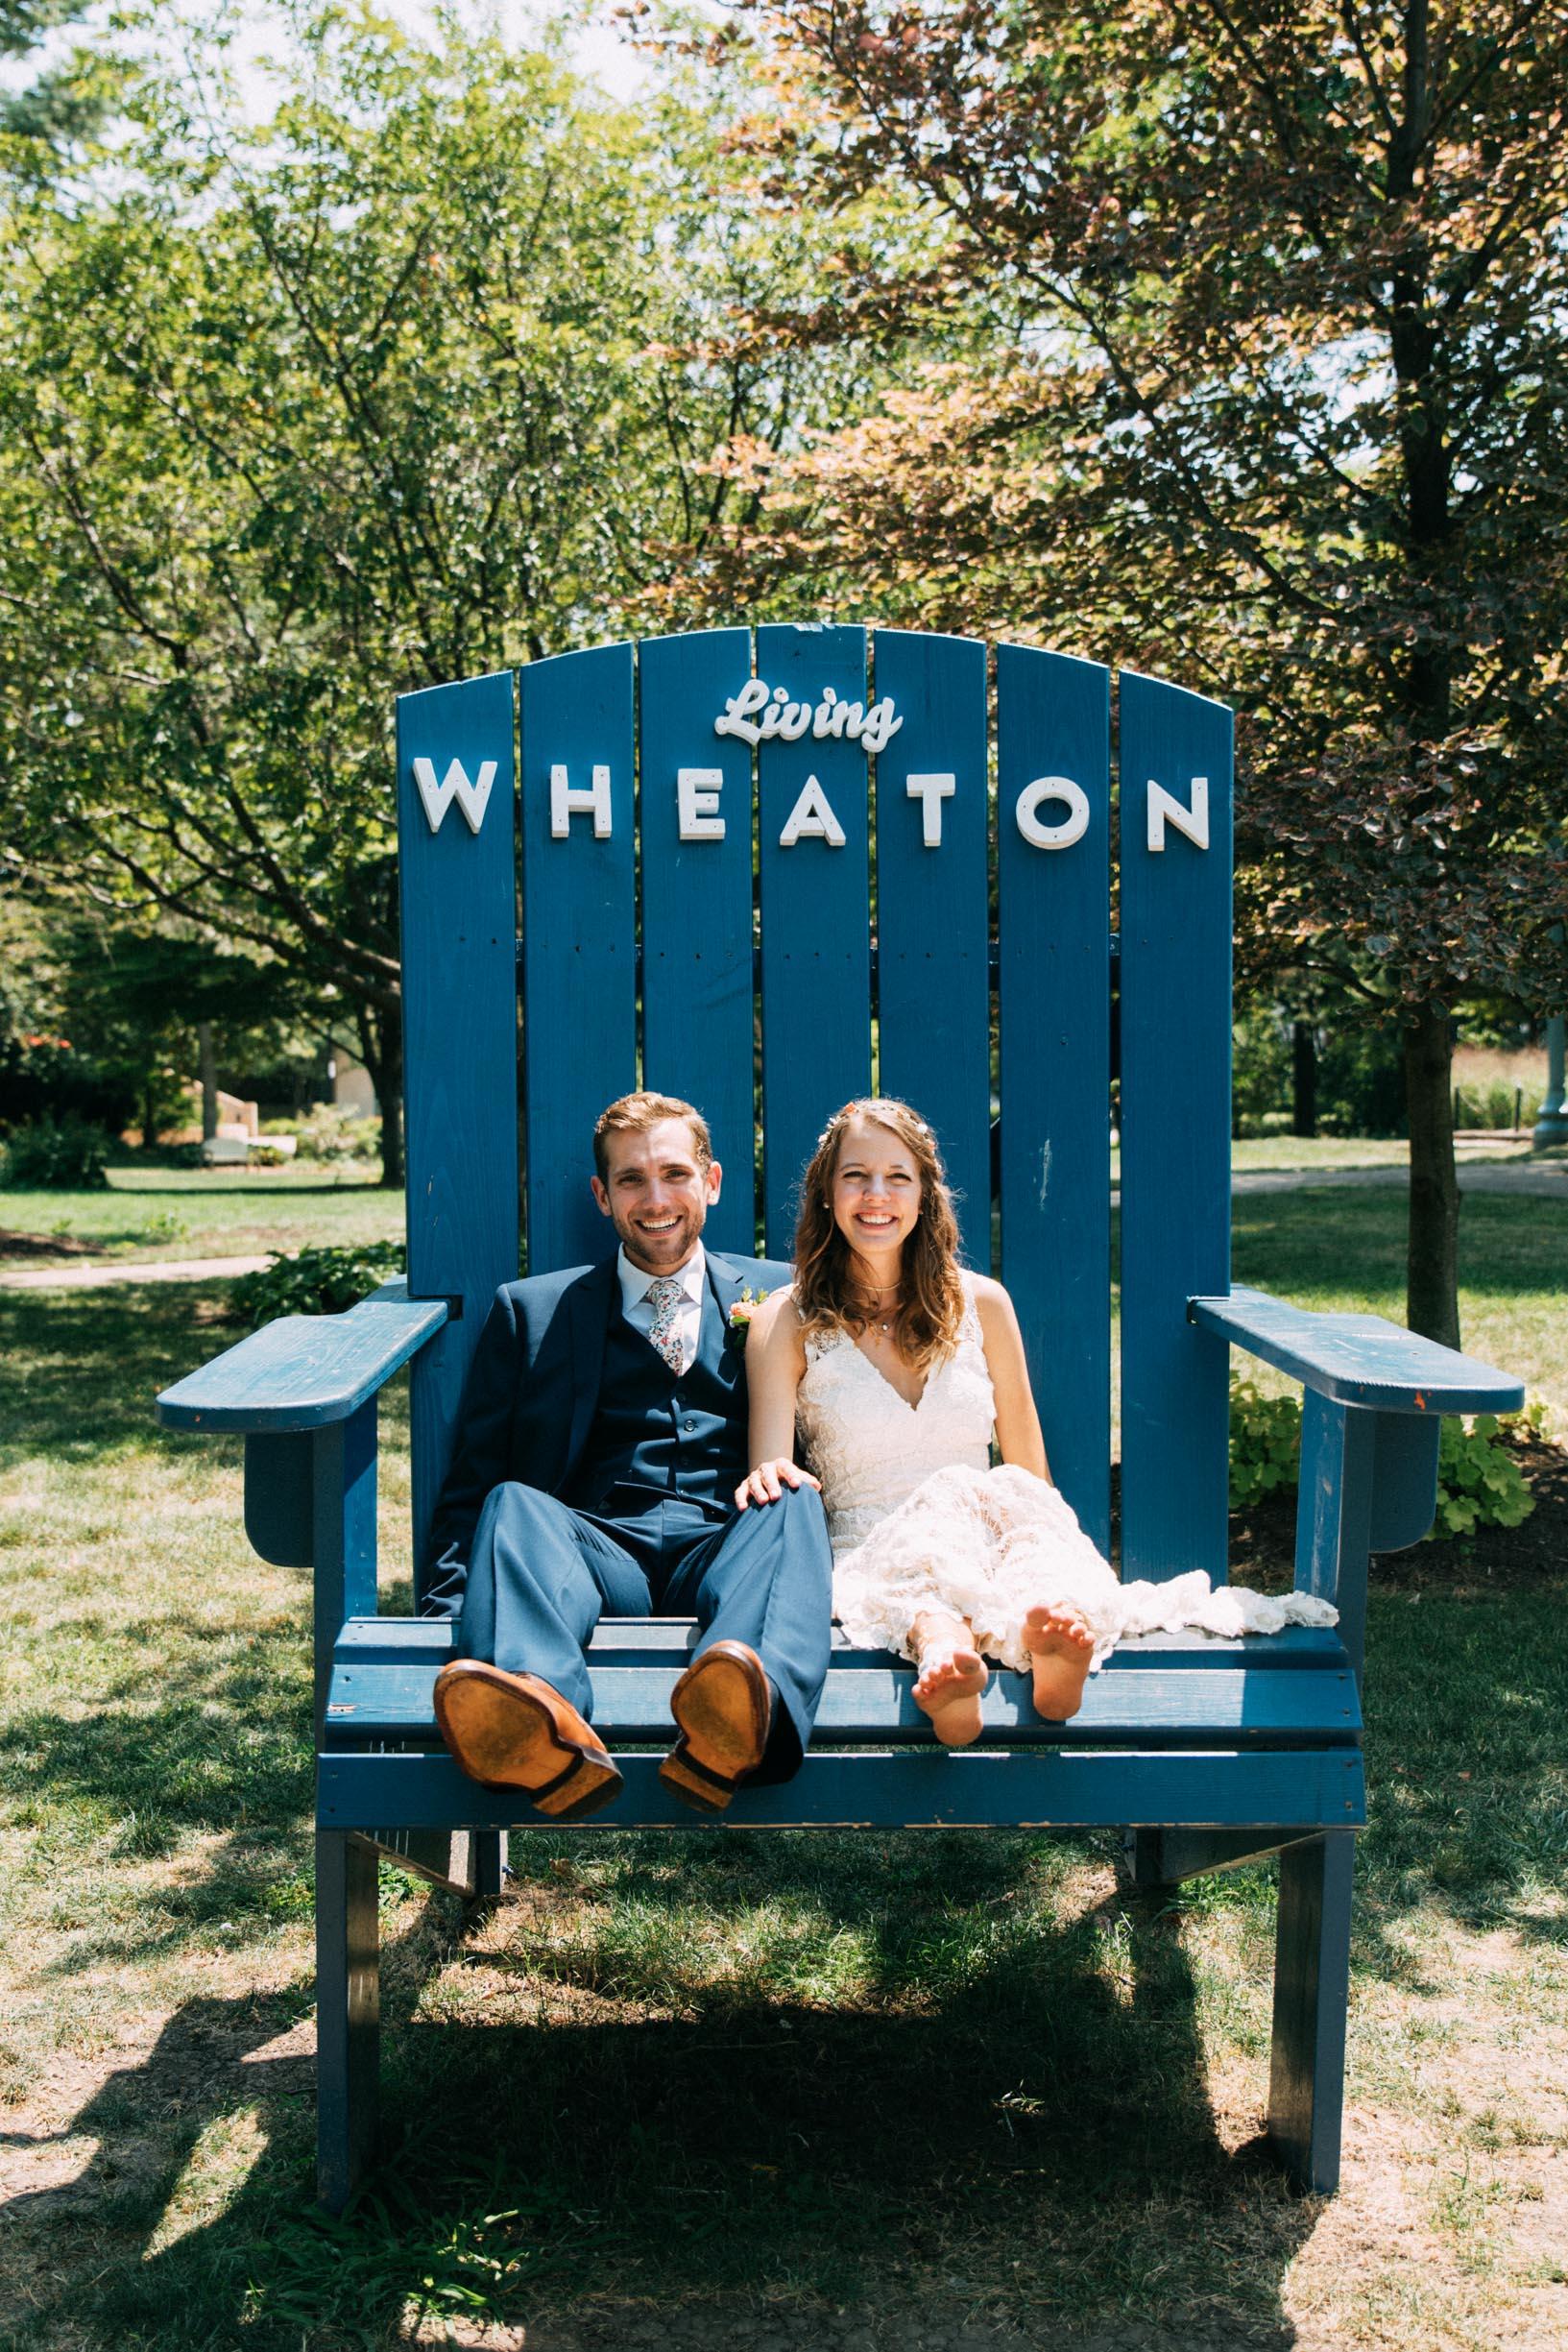 Rachel Josh Wedding Portrait Wheaton Illinois Blog-24.jpg